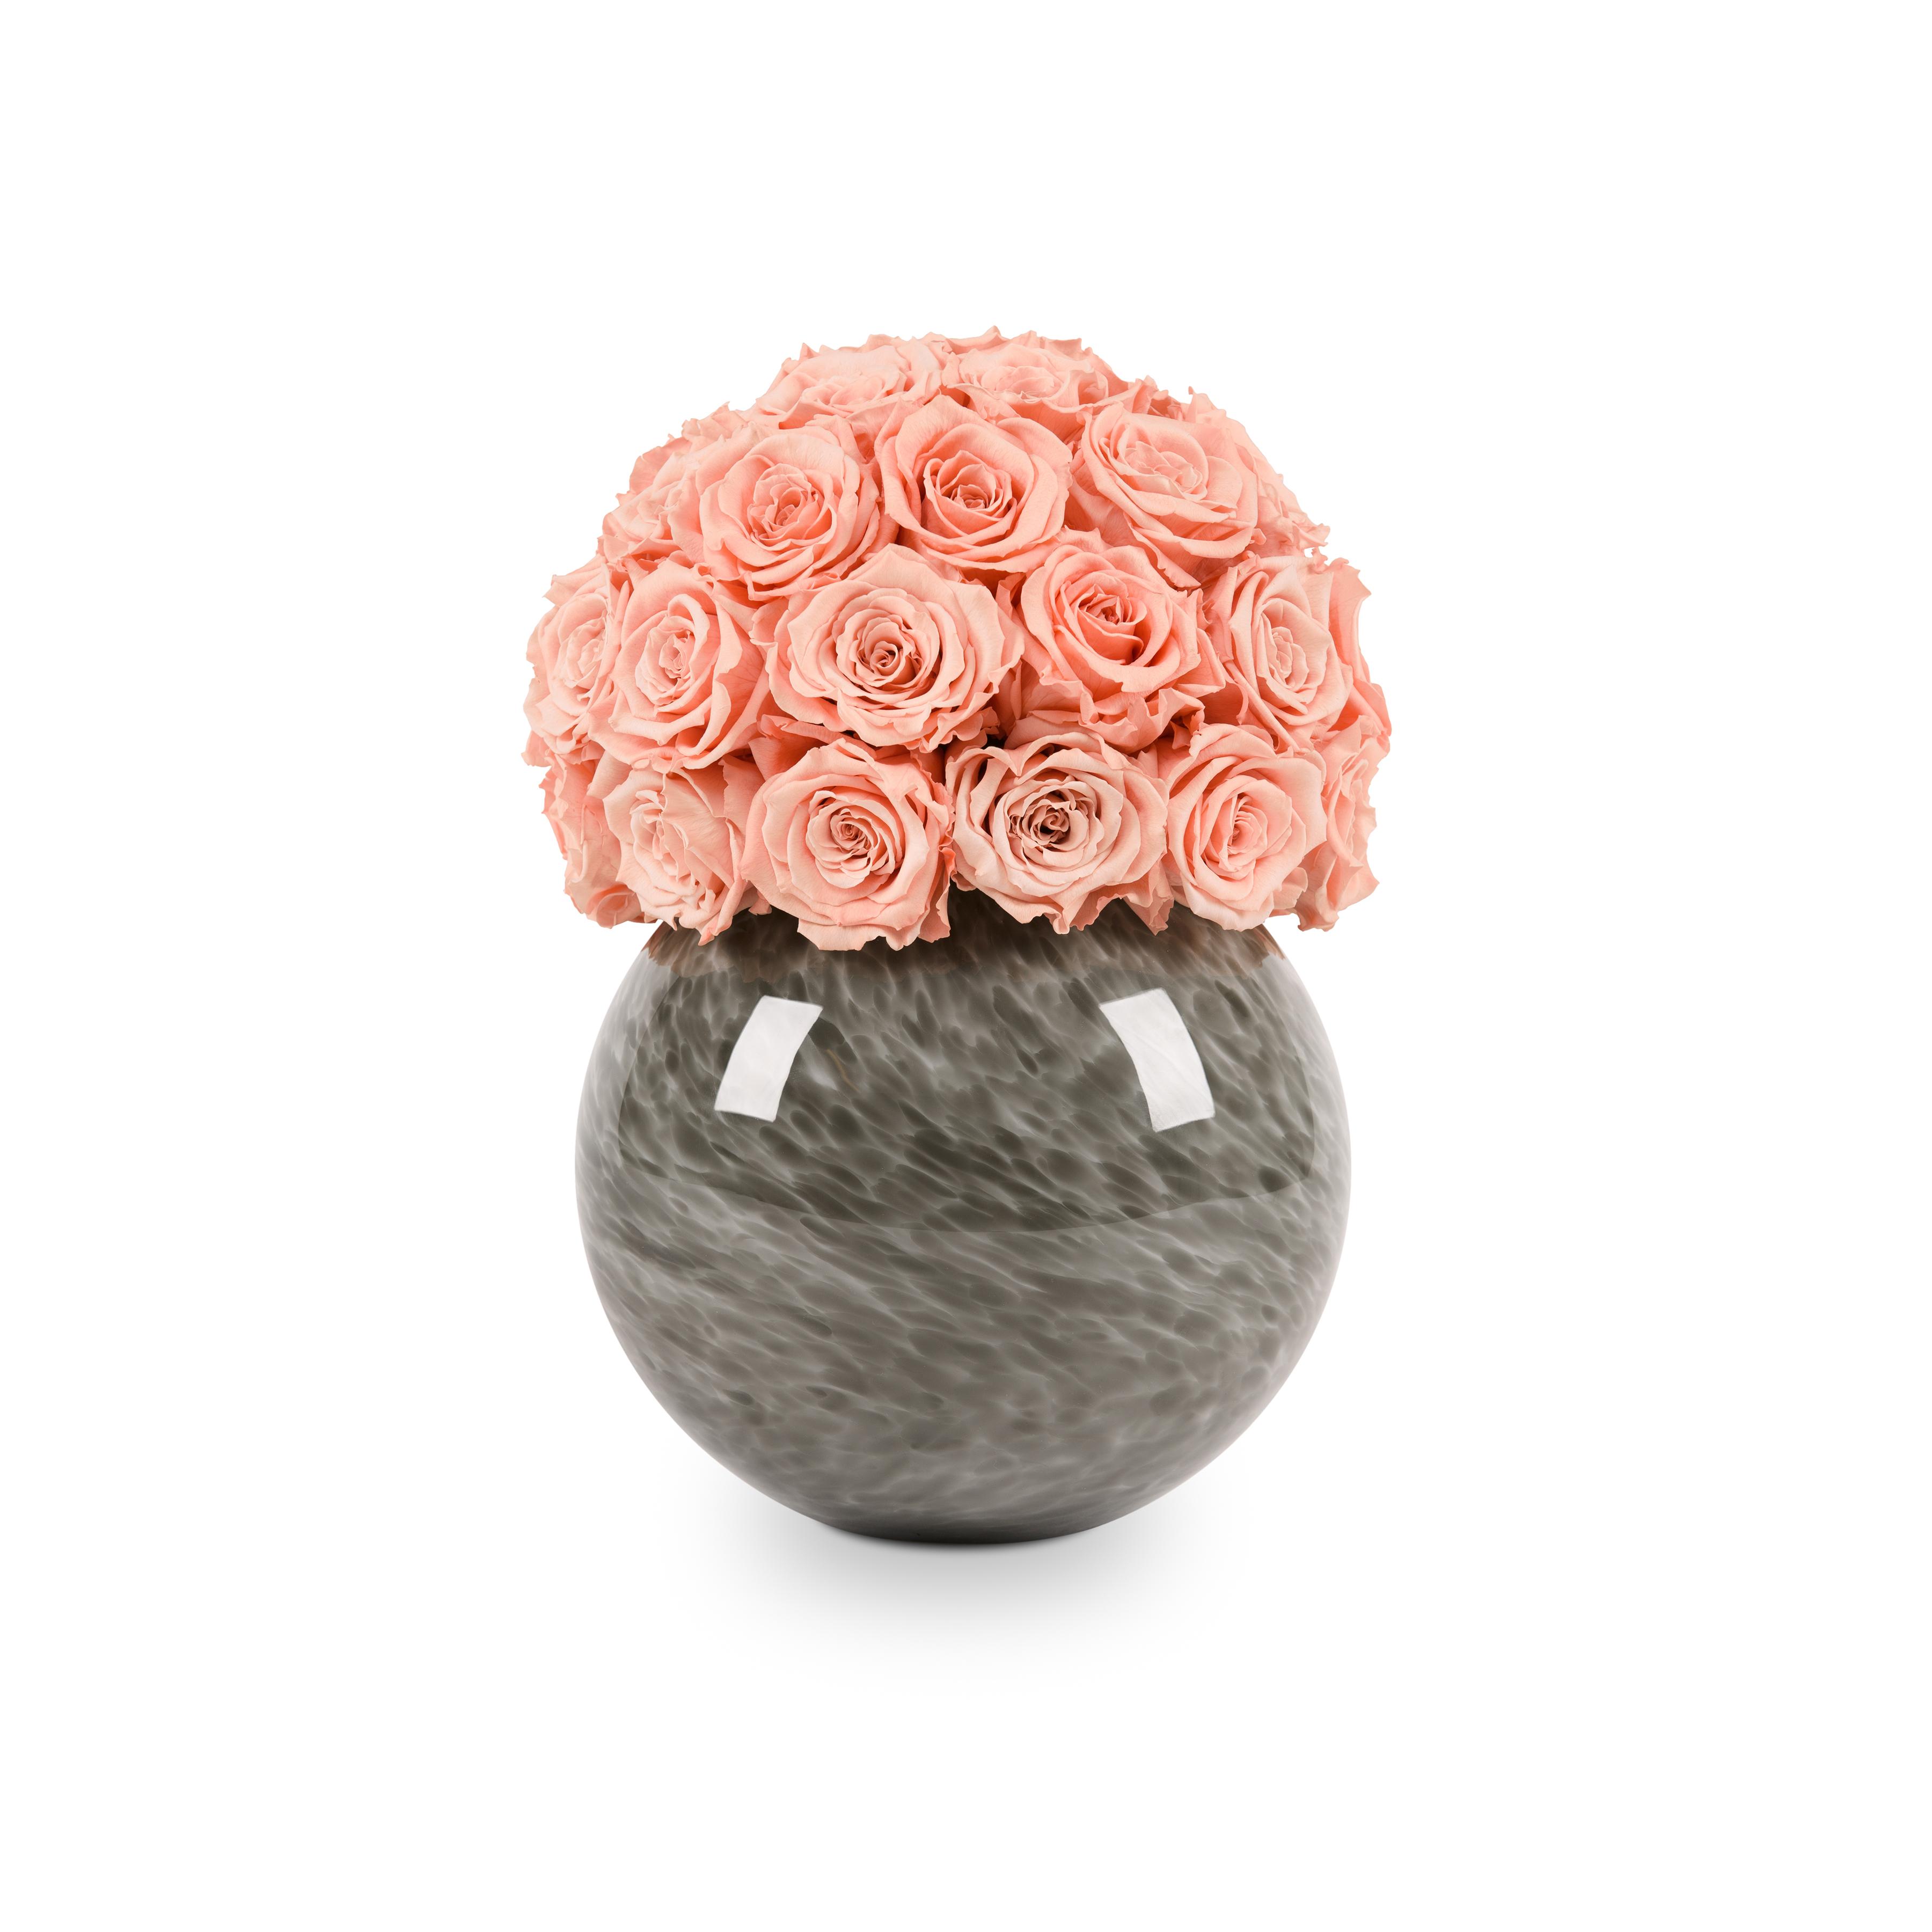 Infinite Rose Palacio Dome Roses Delivered Dubai Onlyroses